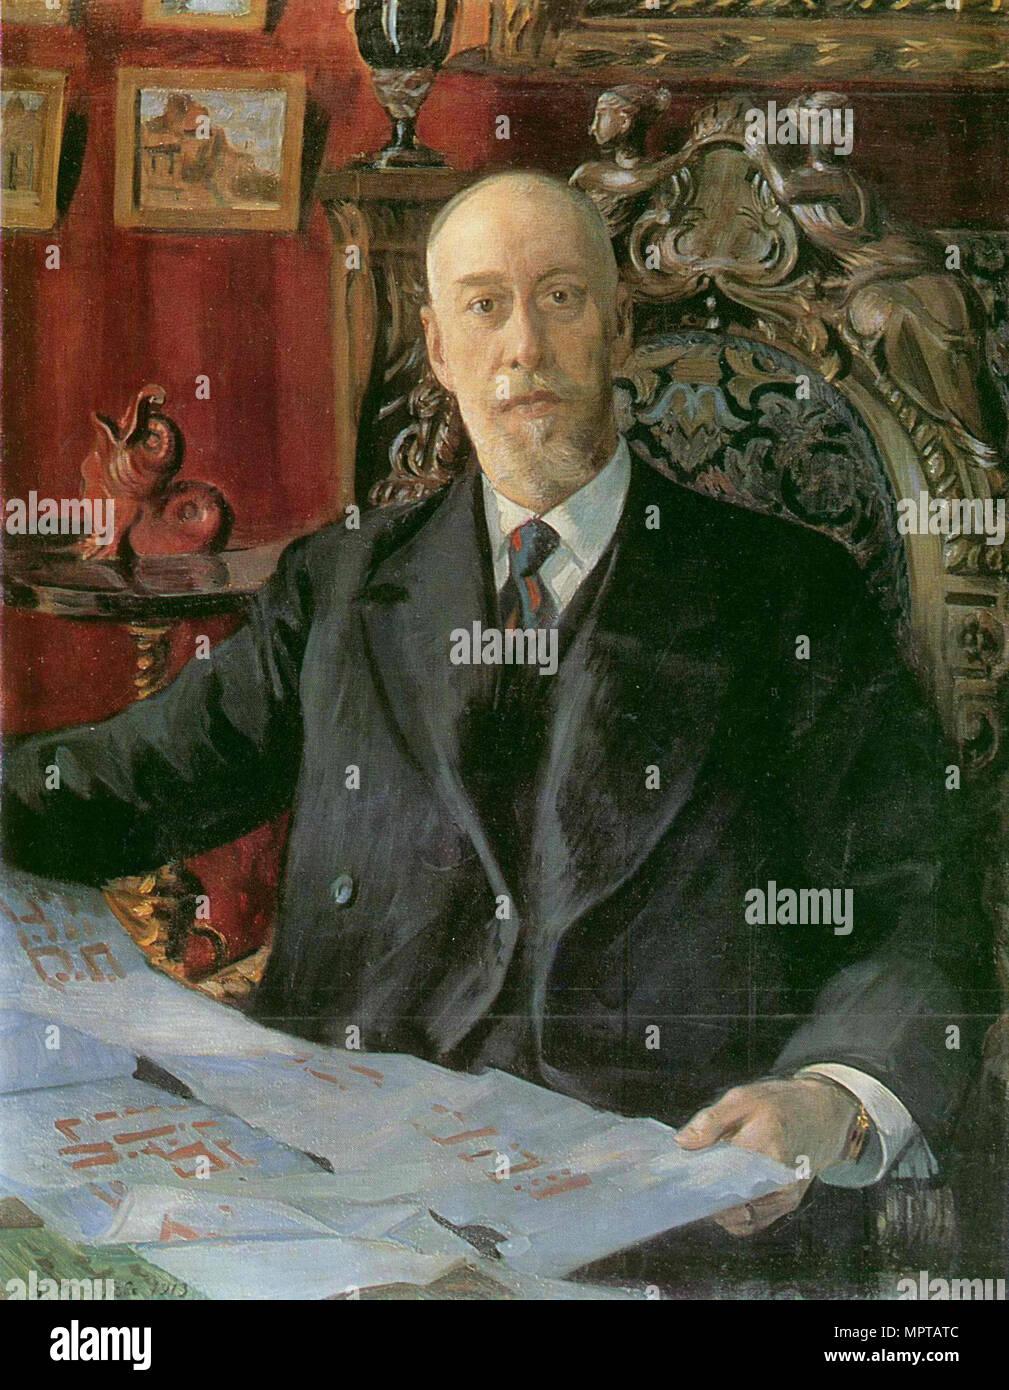 Portrait von Nikolai Karlovich von Meck (1863-1929). Stockbild